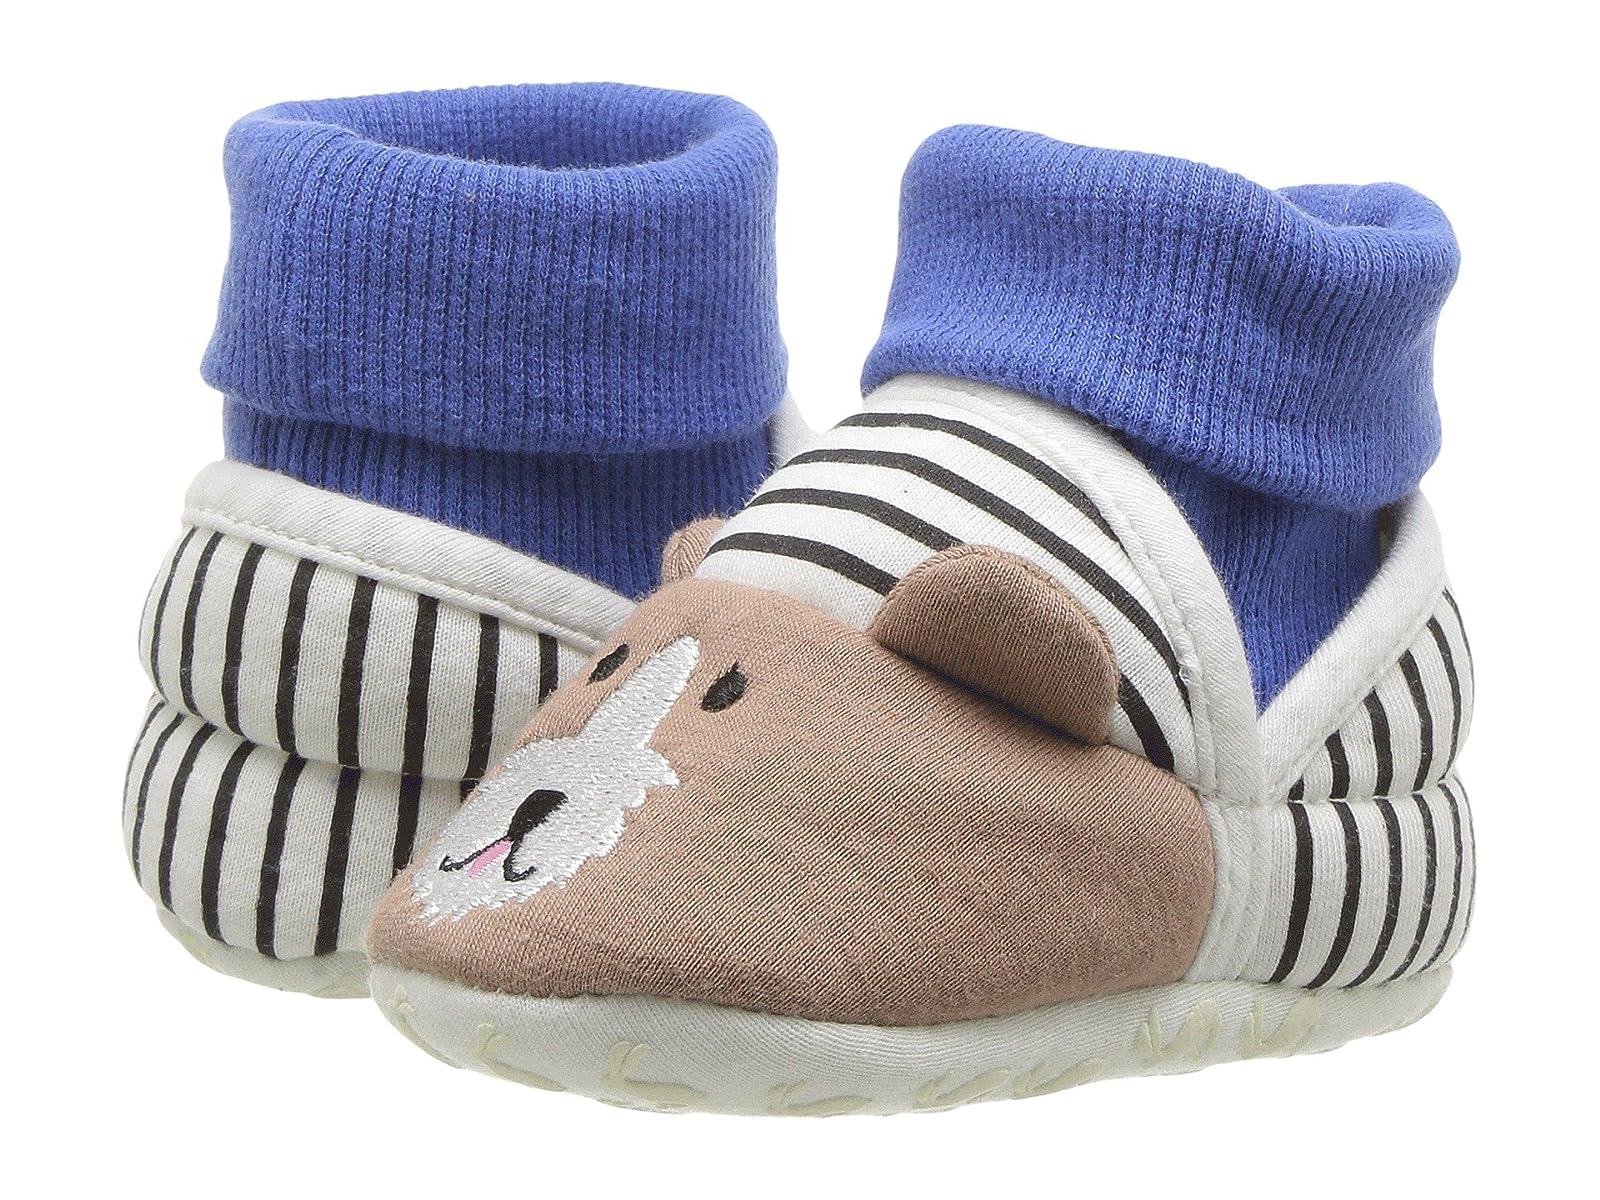 Joules Kids Nipper Slipper (Infant)Atmospheric grades have affordable shoes